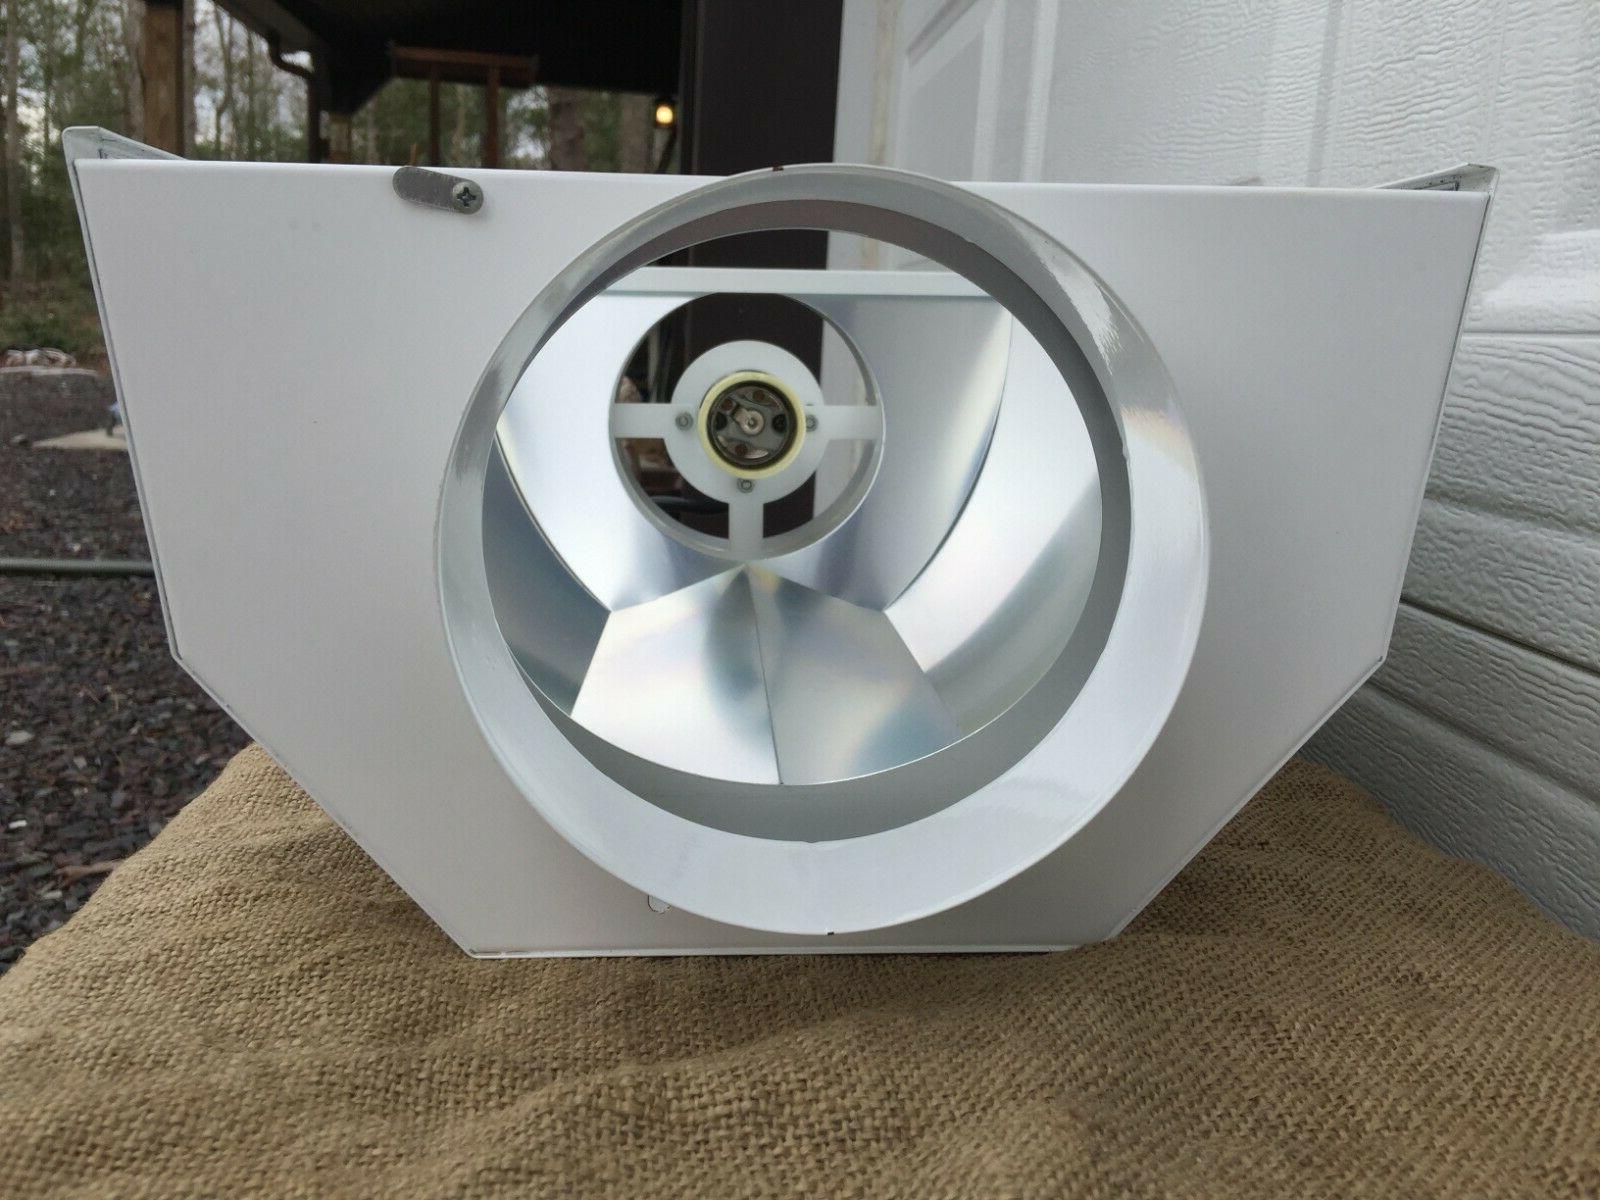 Hydrofarm Air Cooled Light Hood